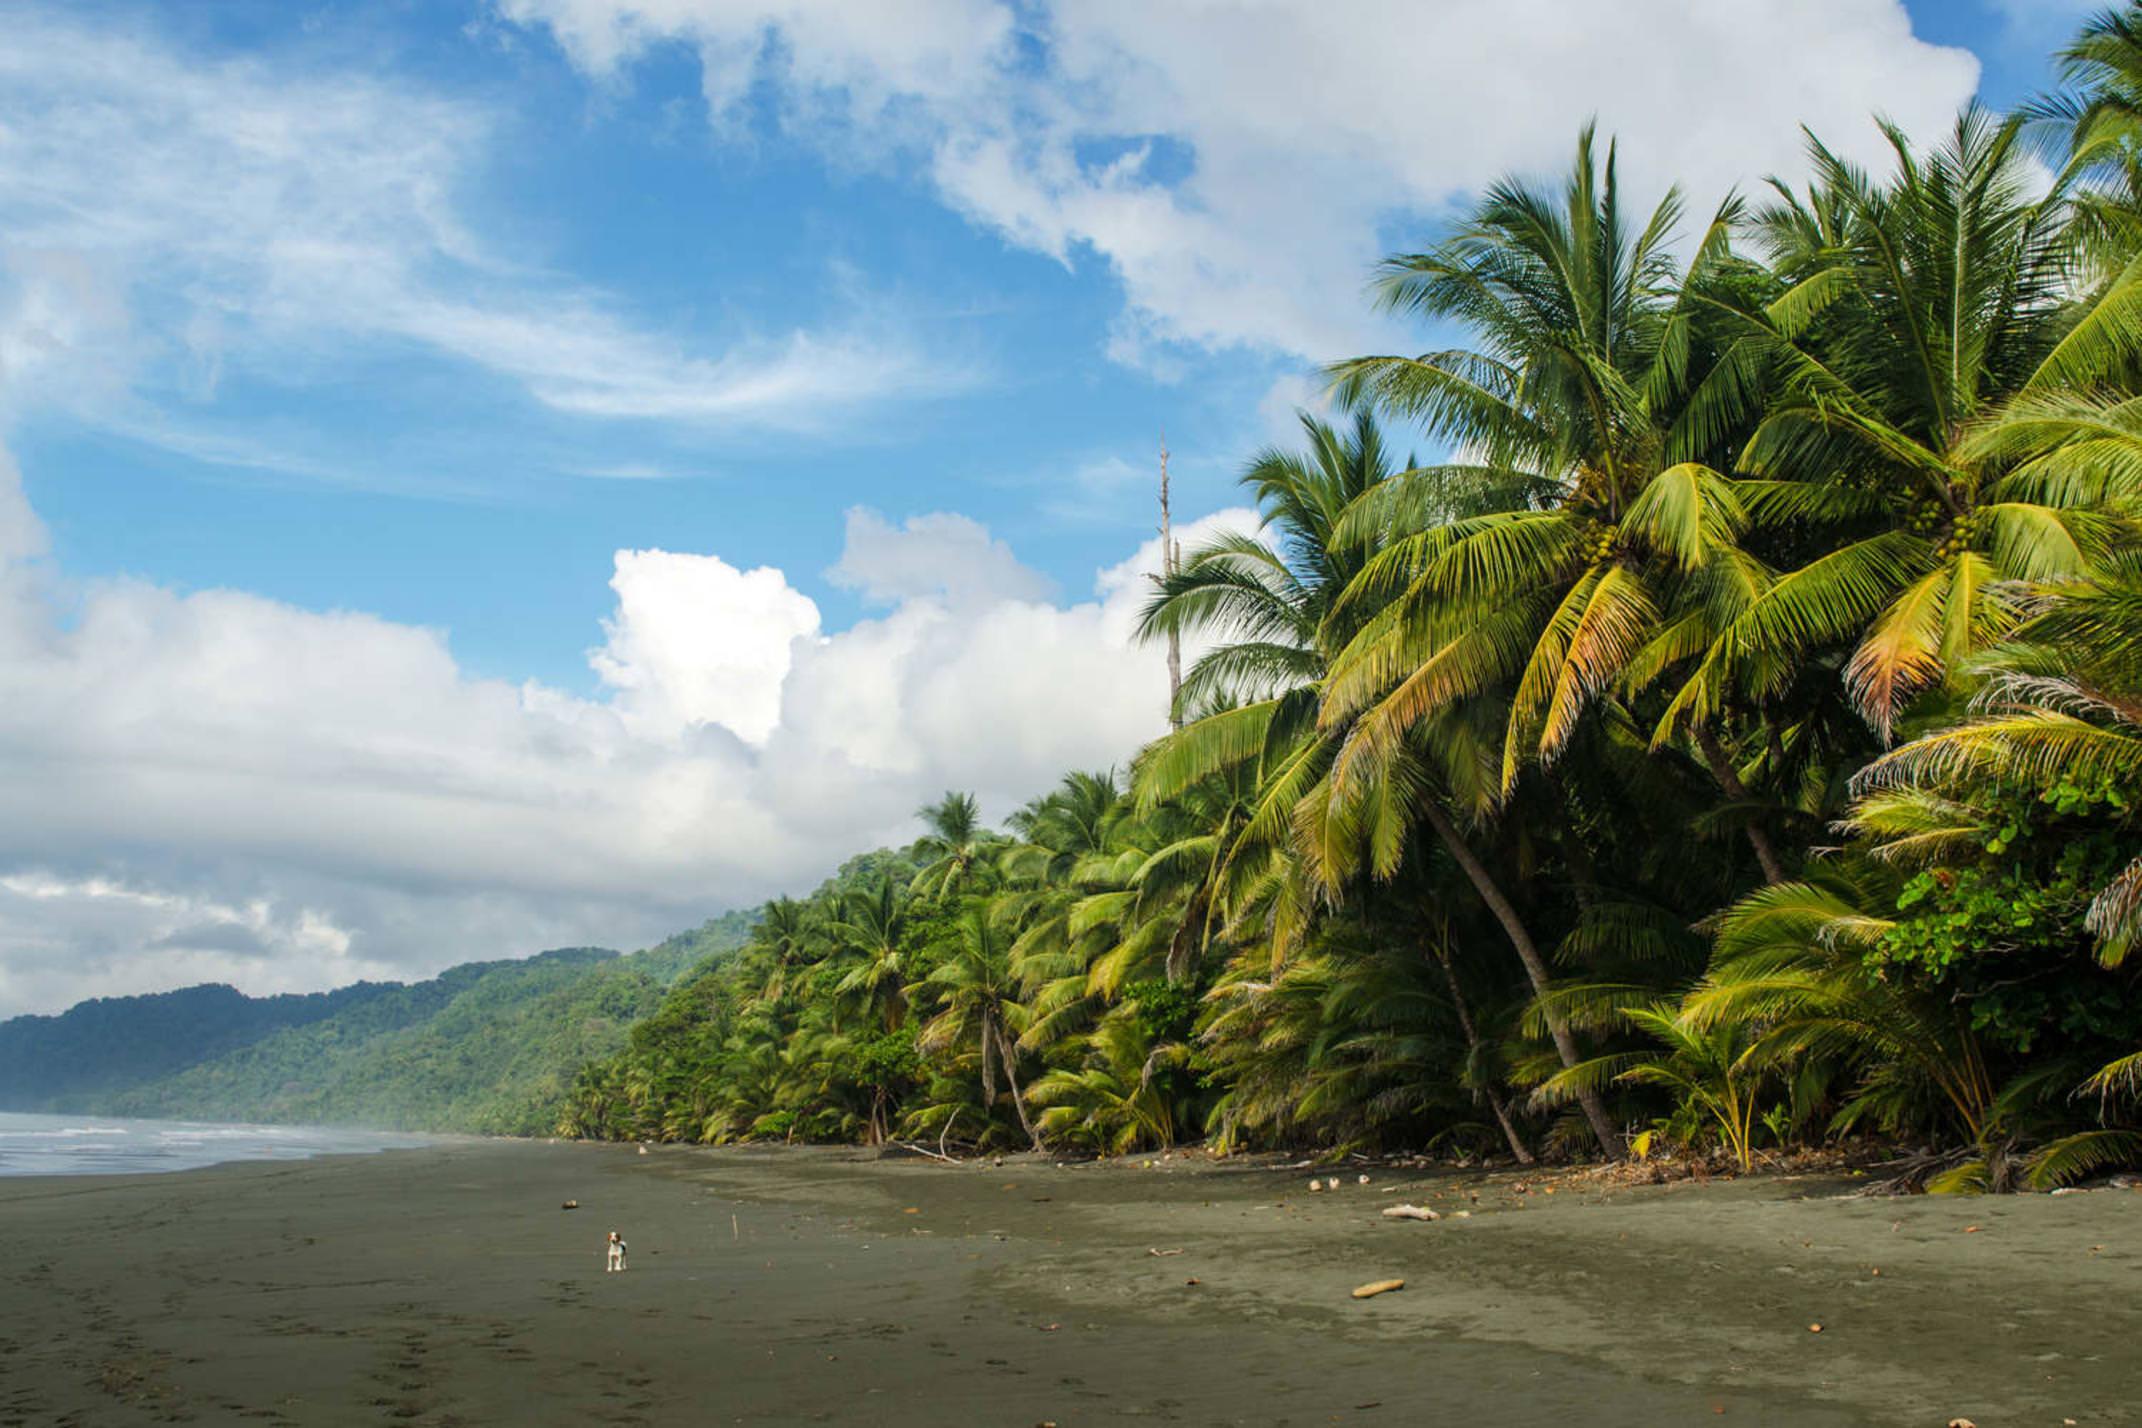 Costa rica osa peninsula corcovado national park beach view osa peninsula costa rica